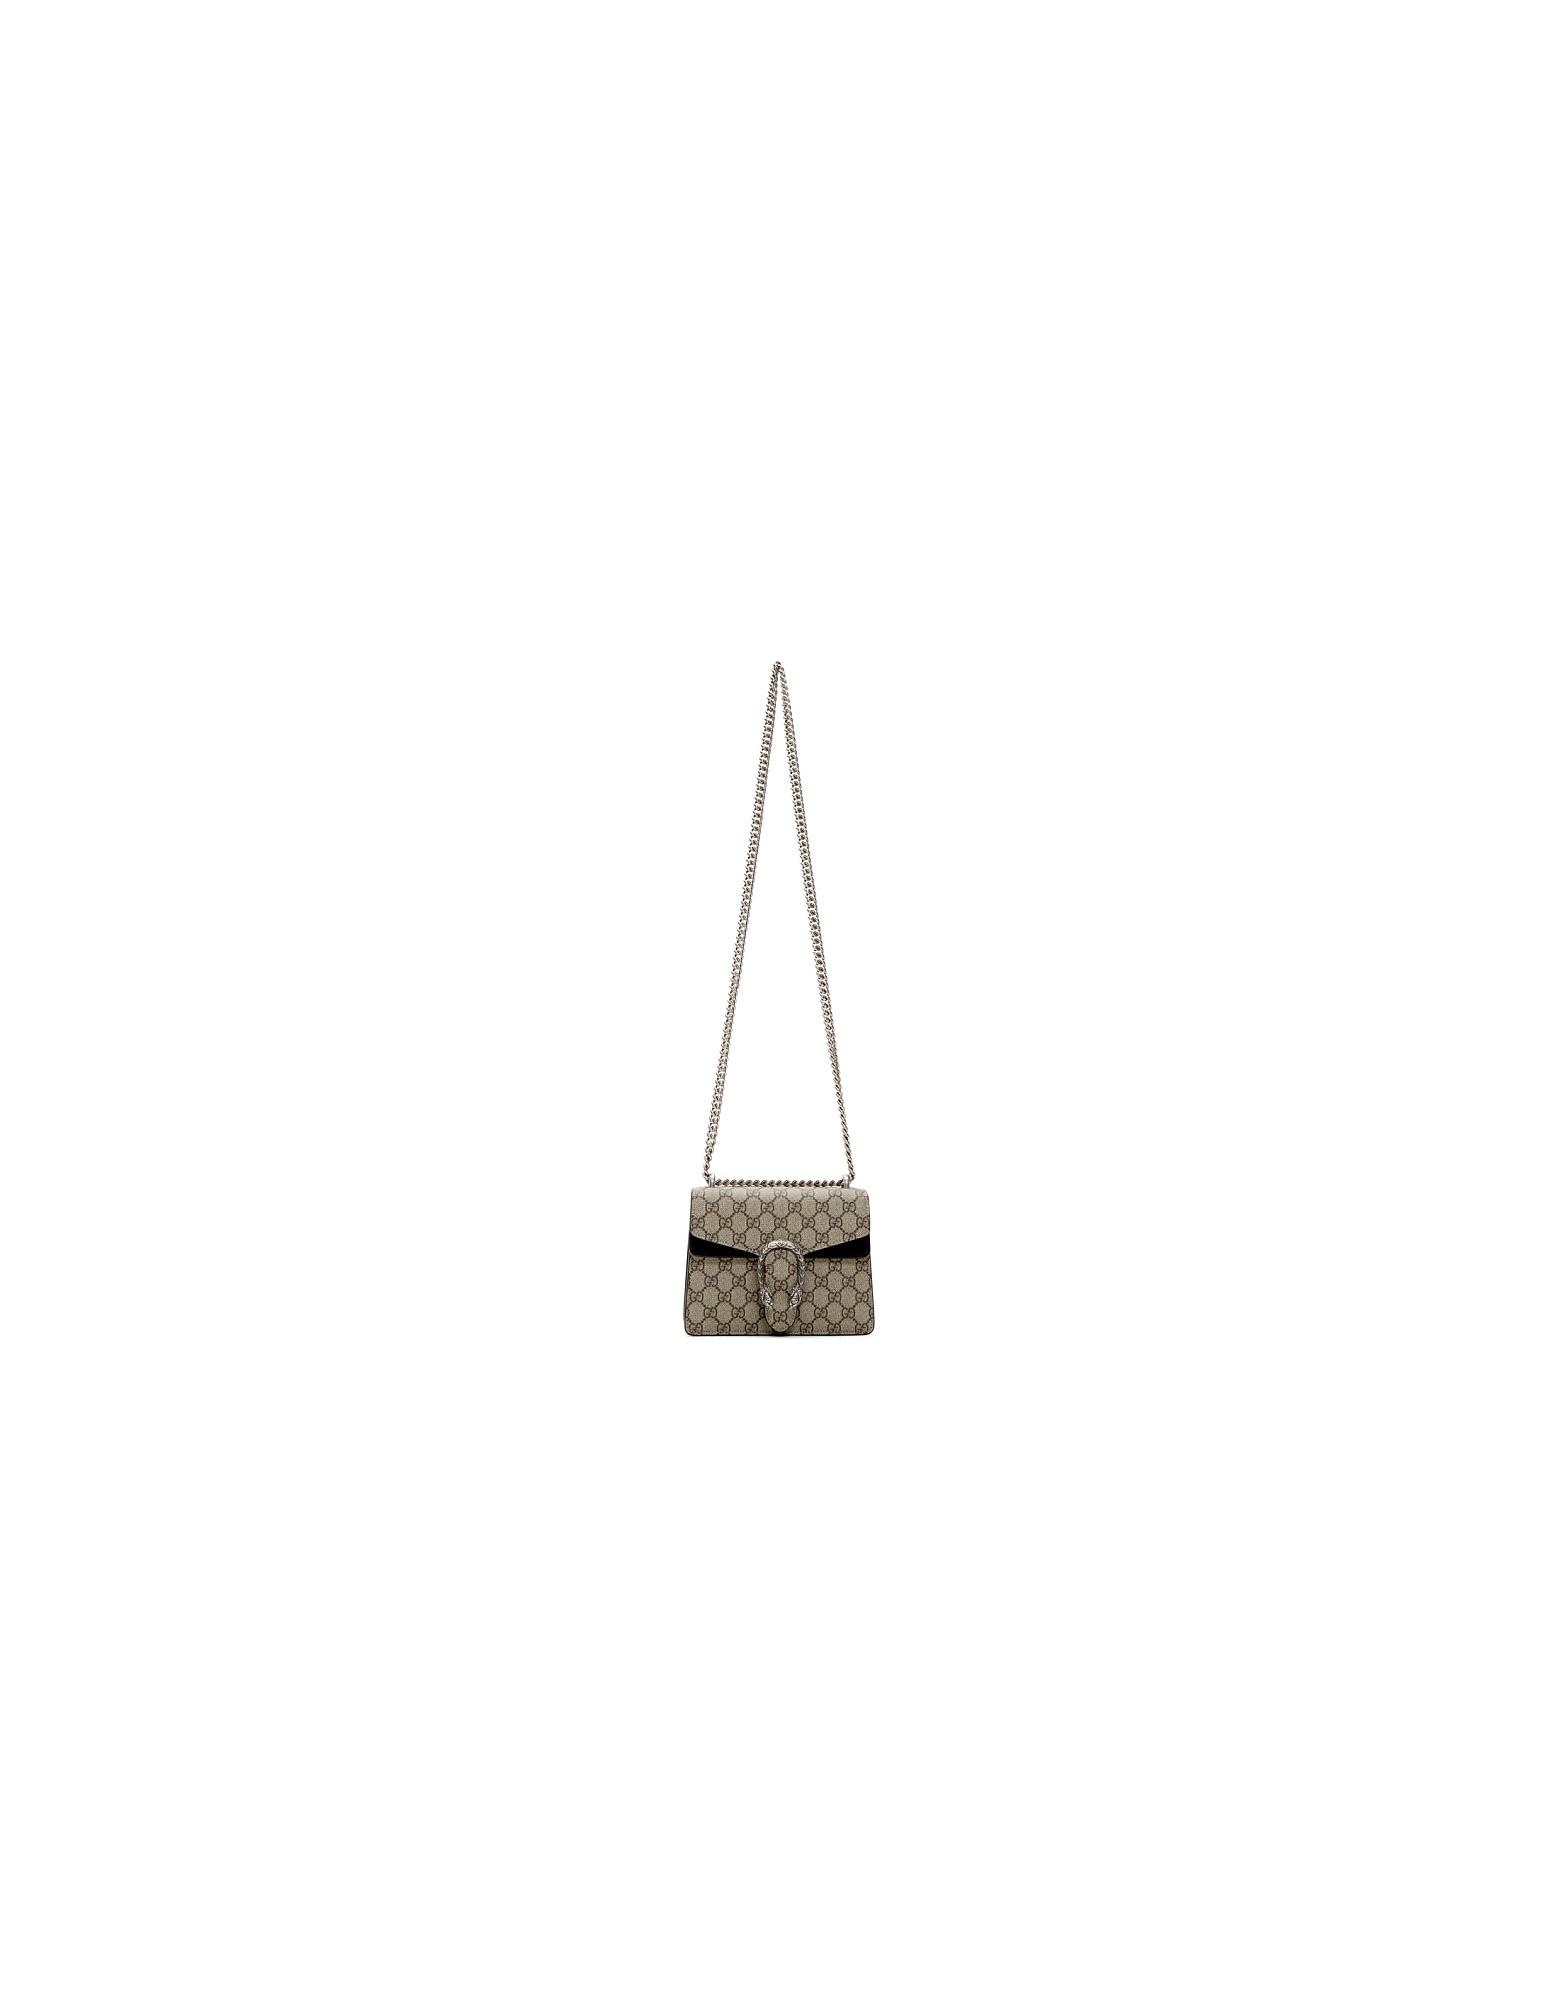 Gucci Designer Handbags, Beige Mini Dionysus Shoulder Bag